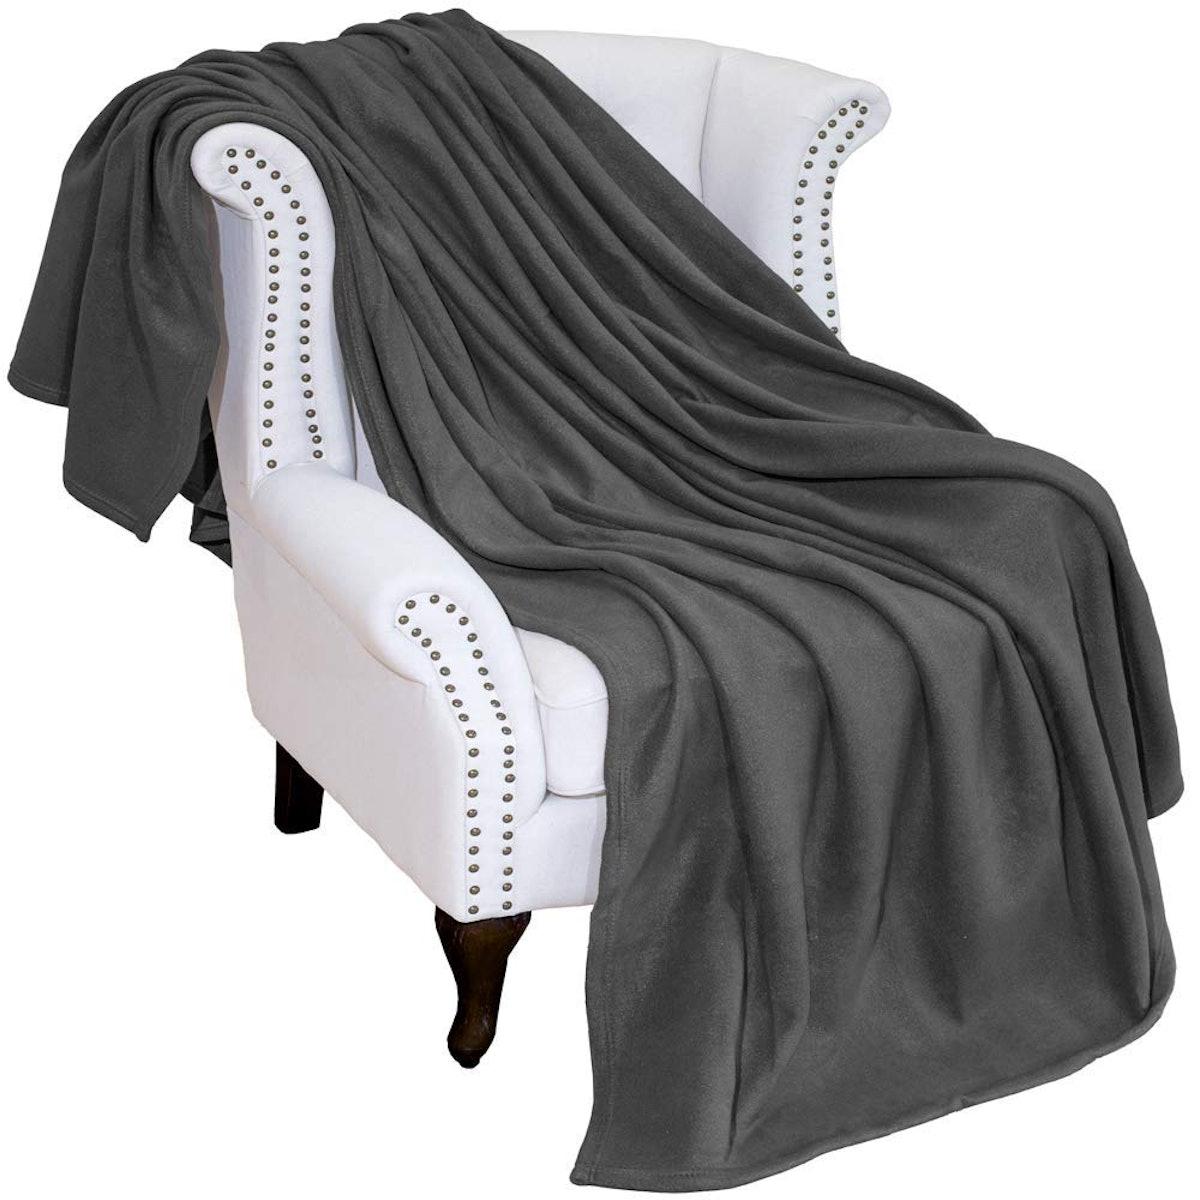 Bare Home Polar Fleece Blanket